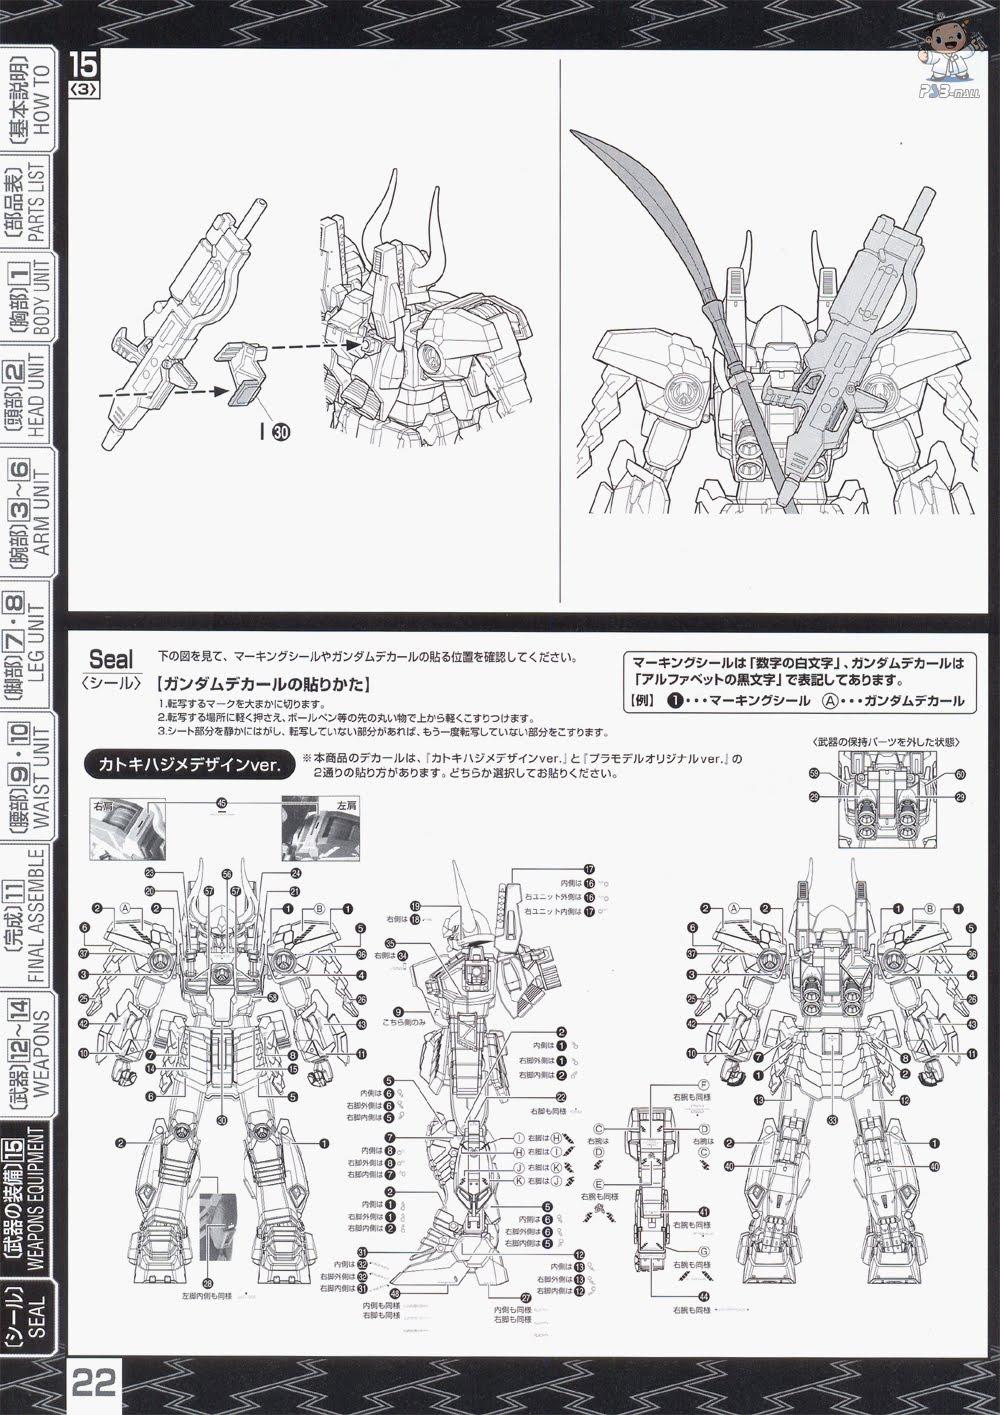 MG 1/100 Musha Gundam Mk-II Runners & Manual Large Images